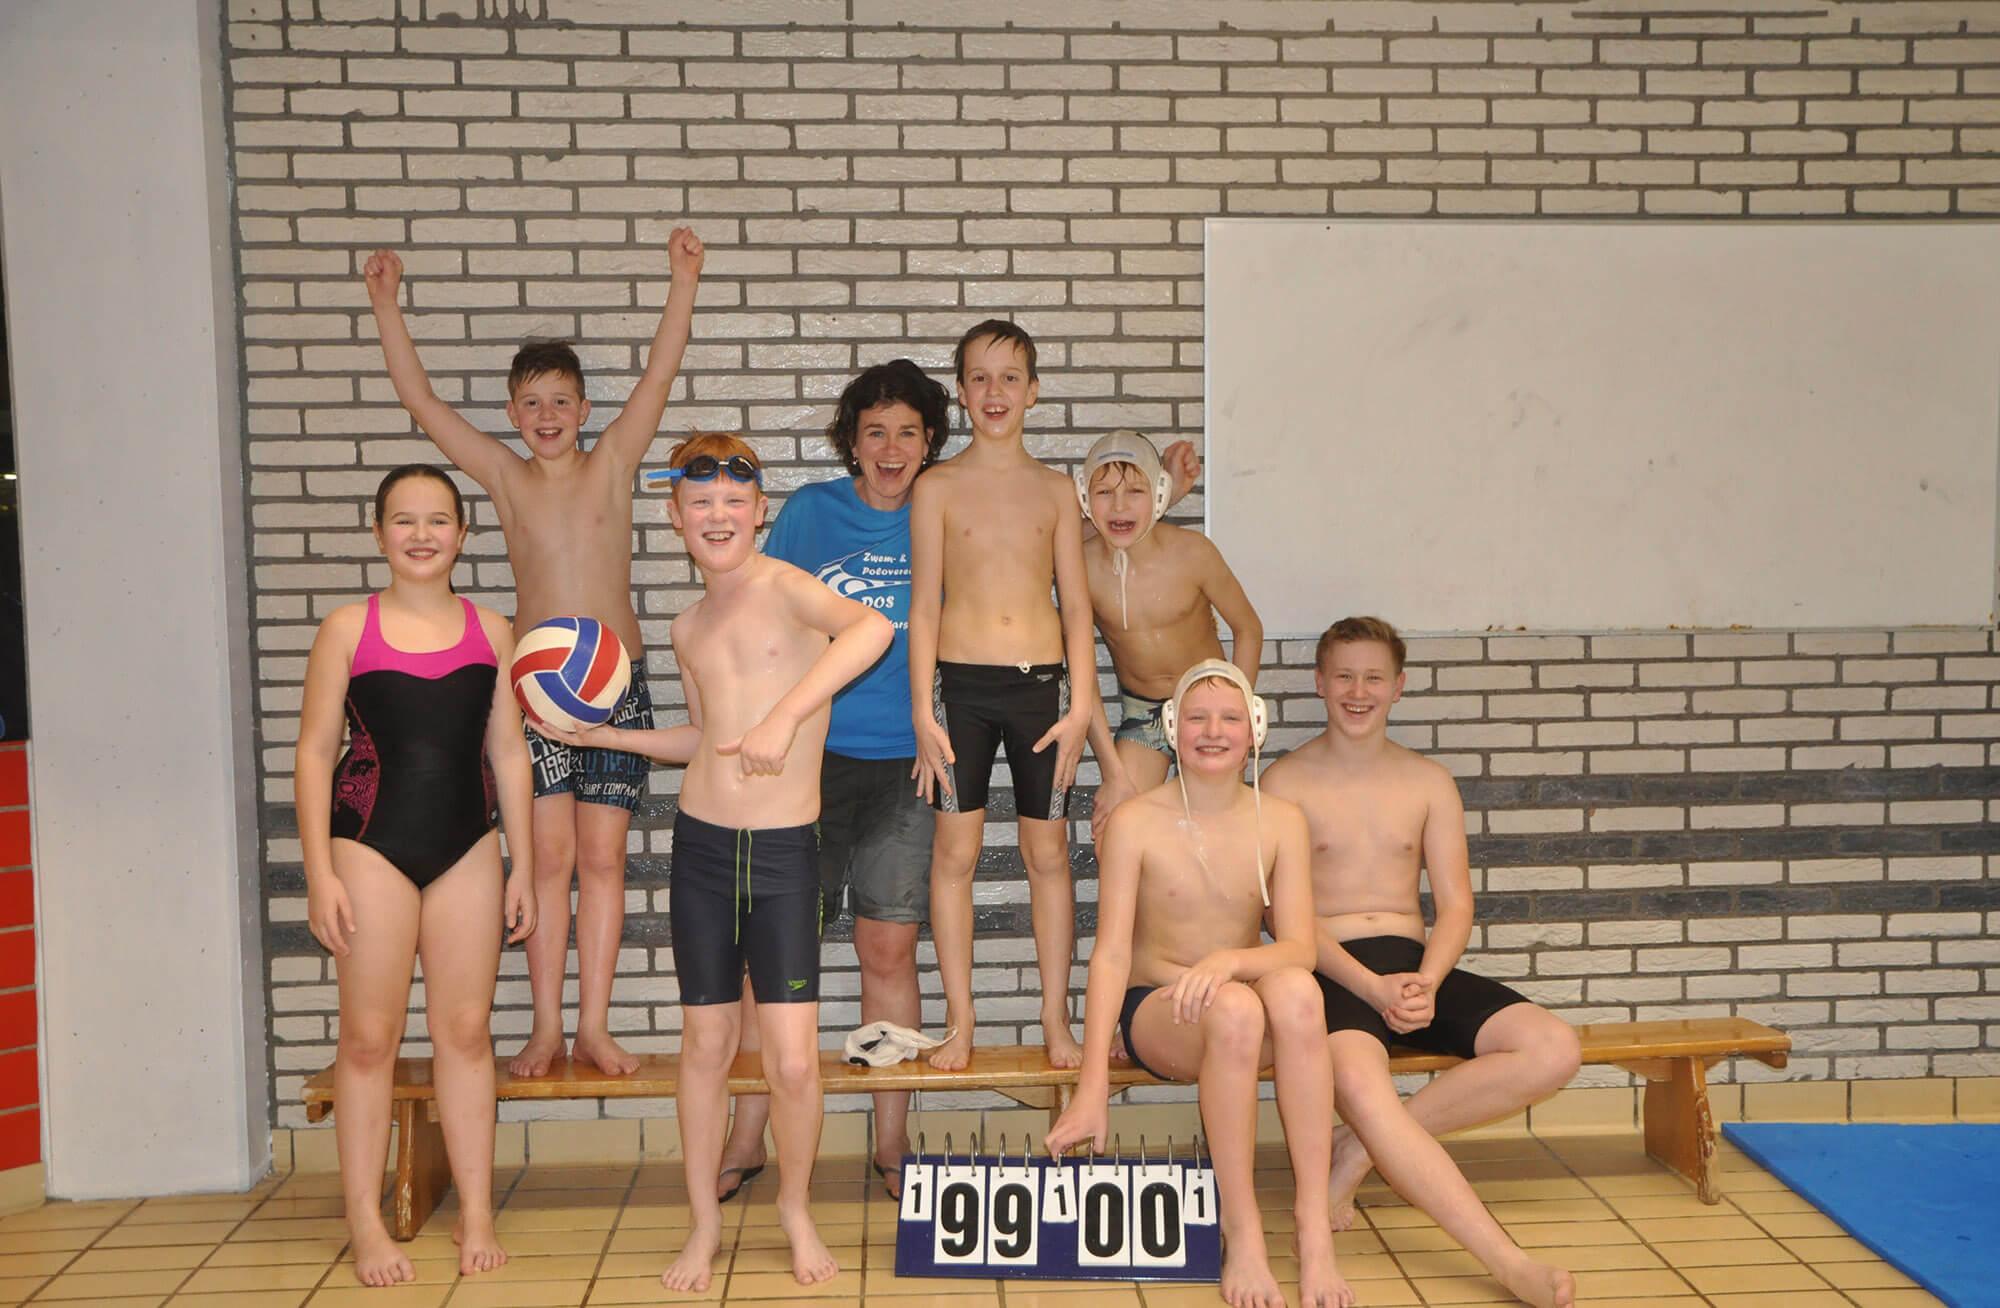 Minipolo toernooi in Varsseveld